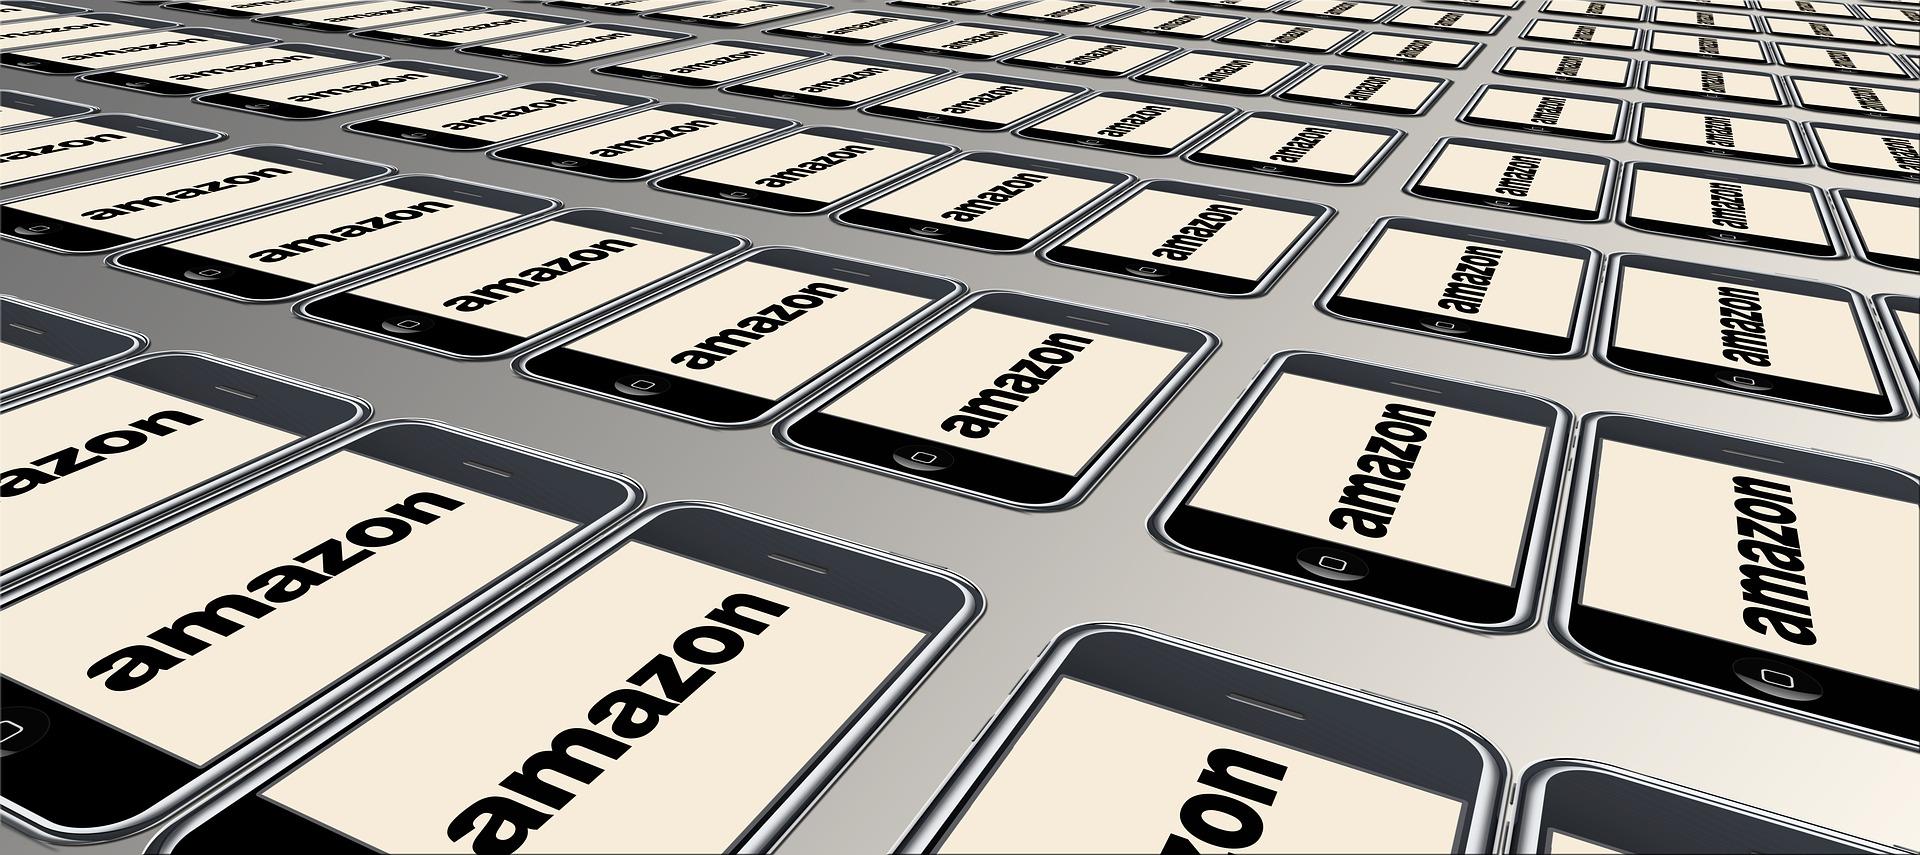 Tipos de vendedores en Amazon